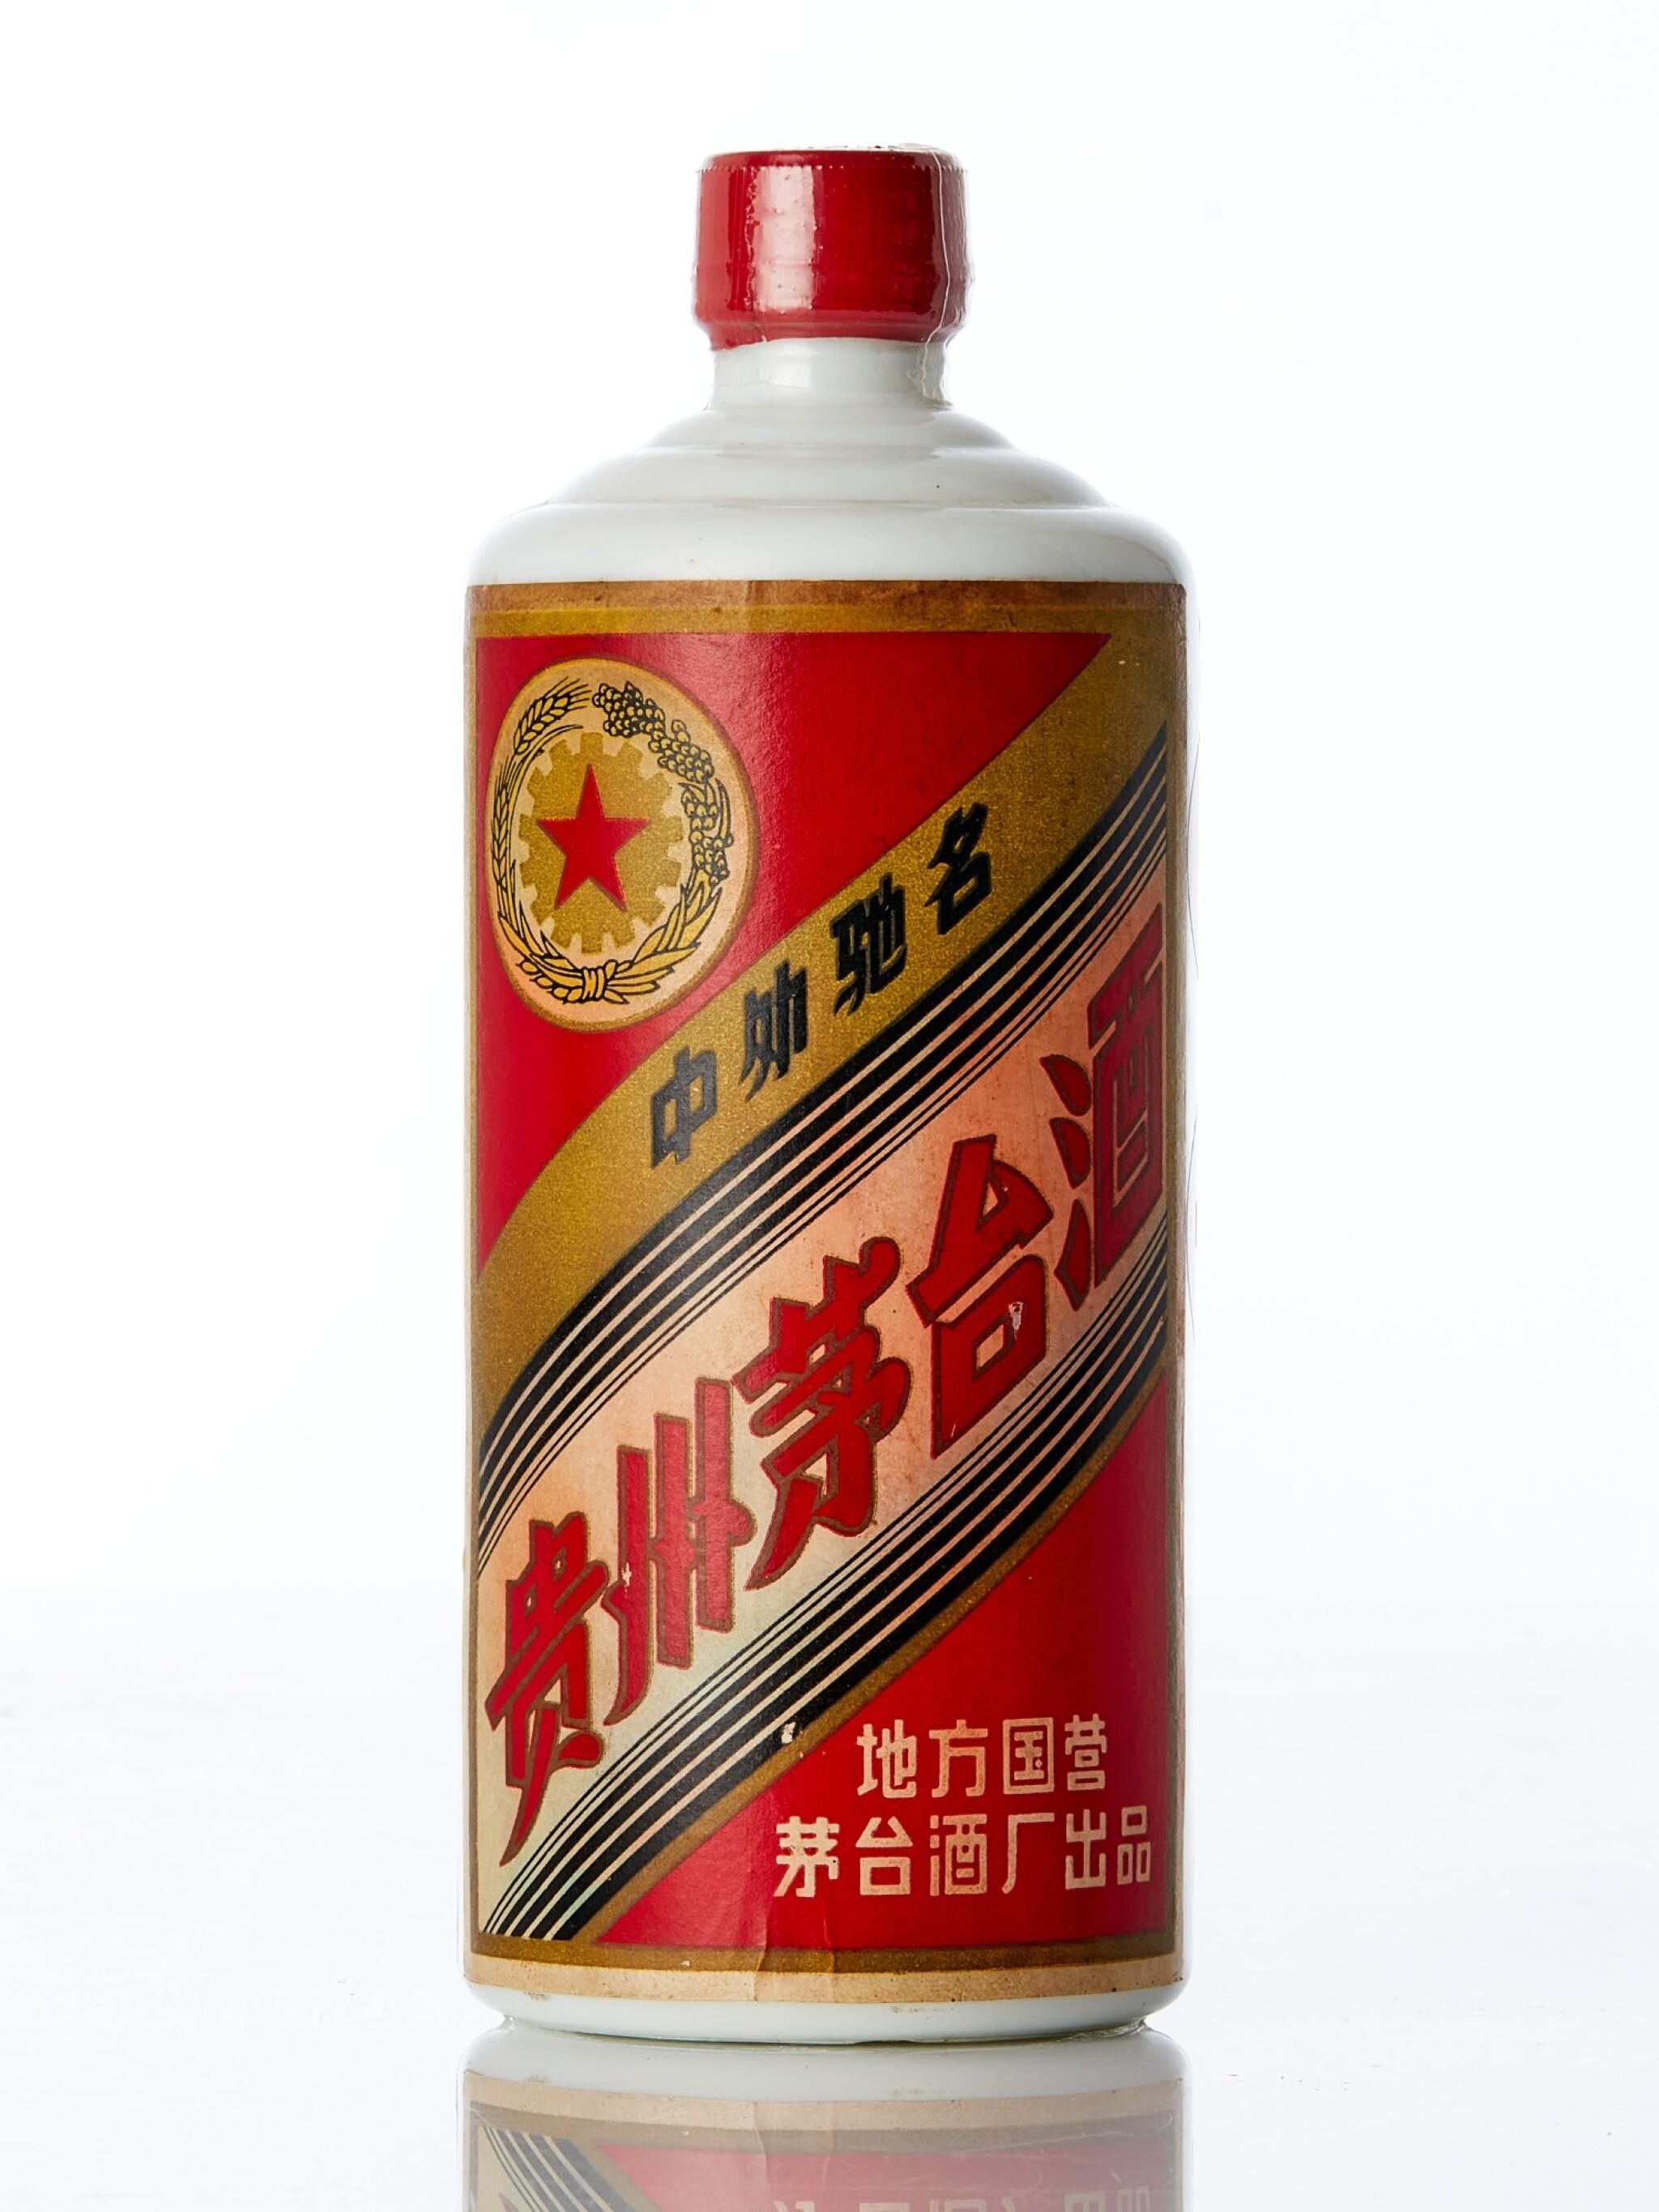 View full screen - View 1 of Lot 5523. 1983-1986年產五星牌內銷貴州茅台酒(地方國營)Kweichow Moutai circa 1983 - 1986 NV (1 BT50)        .